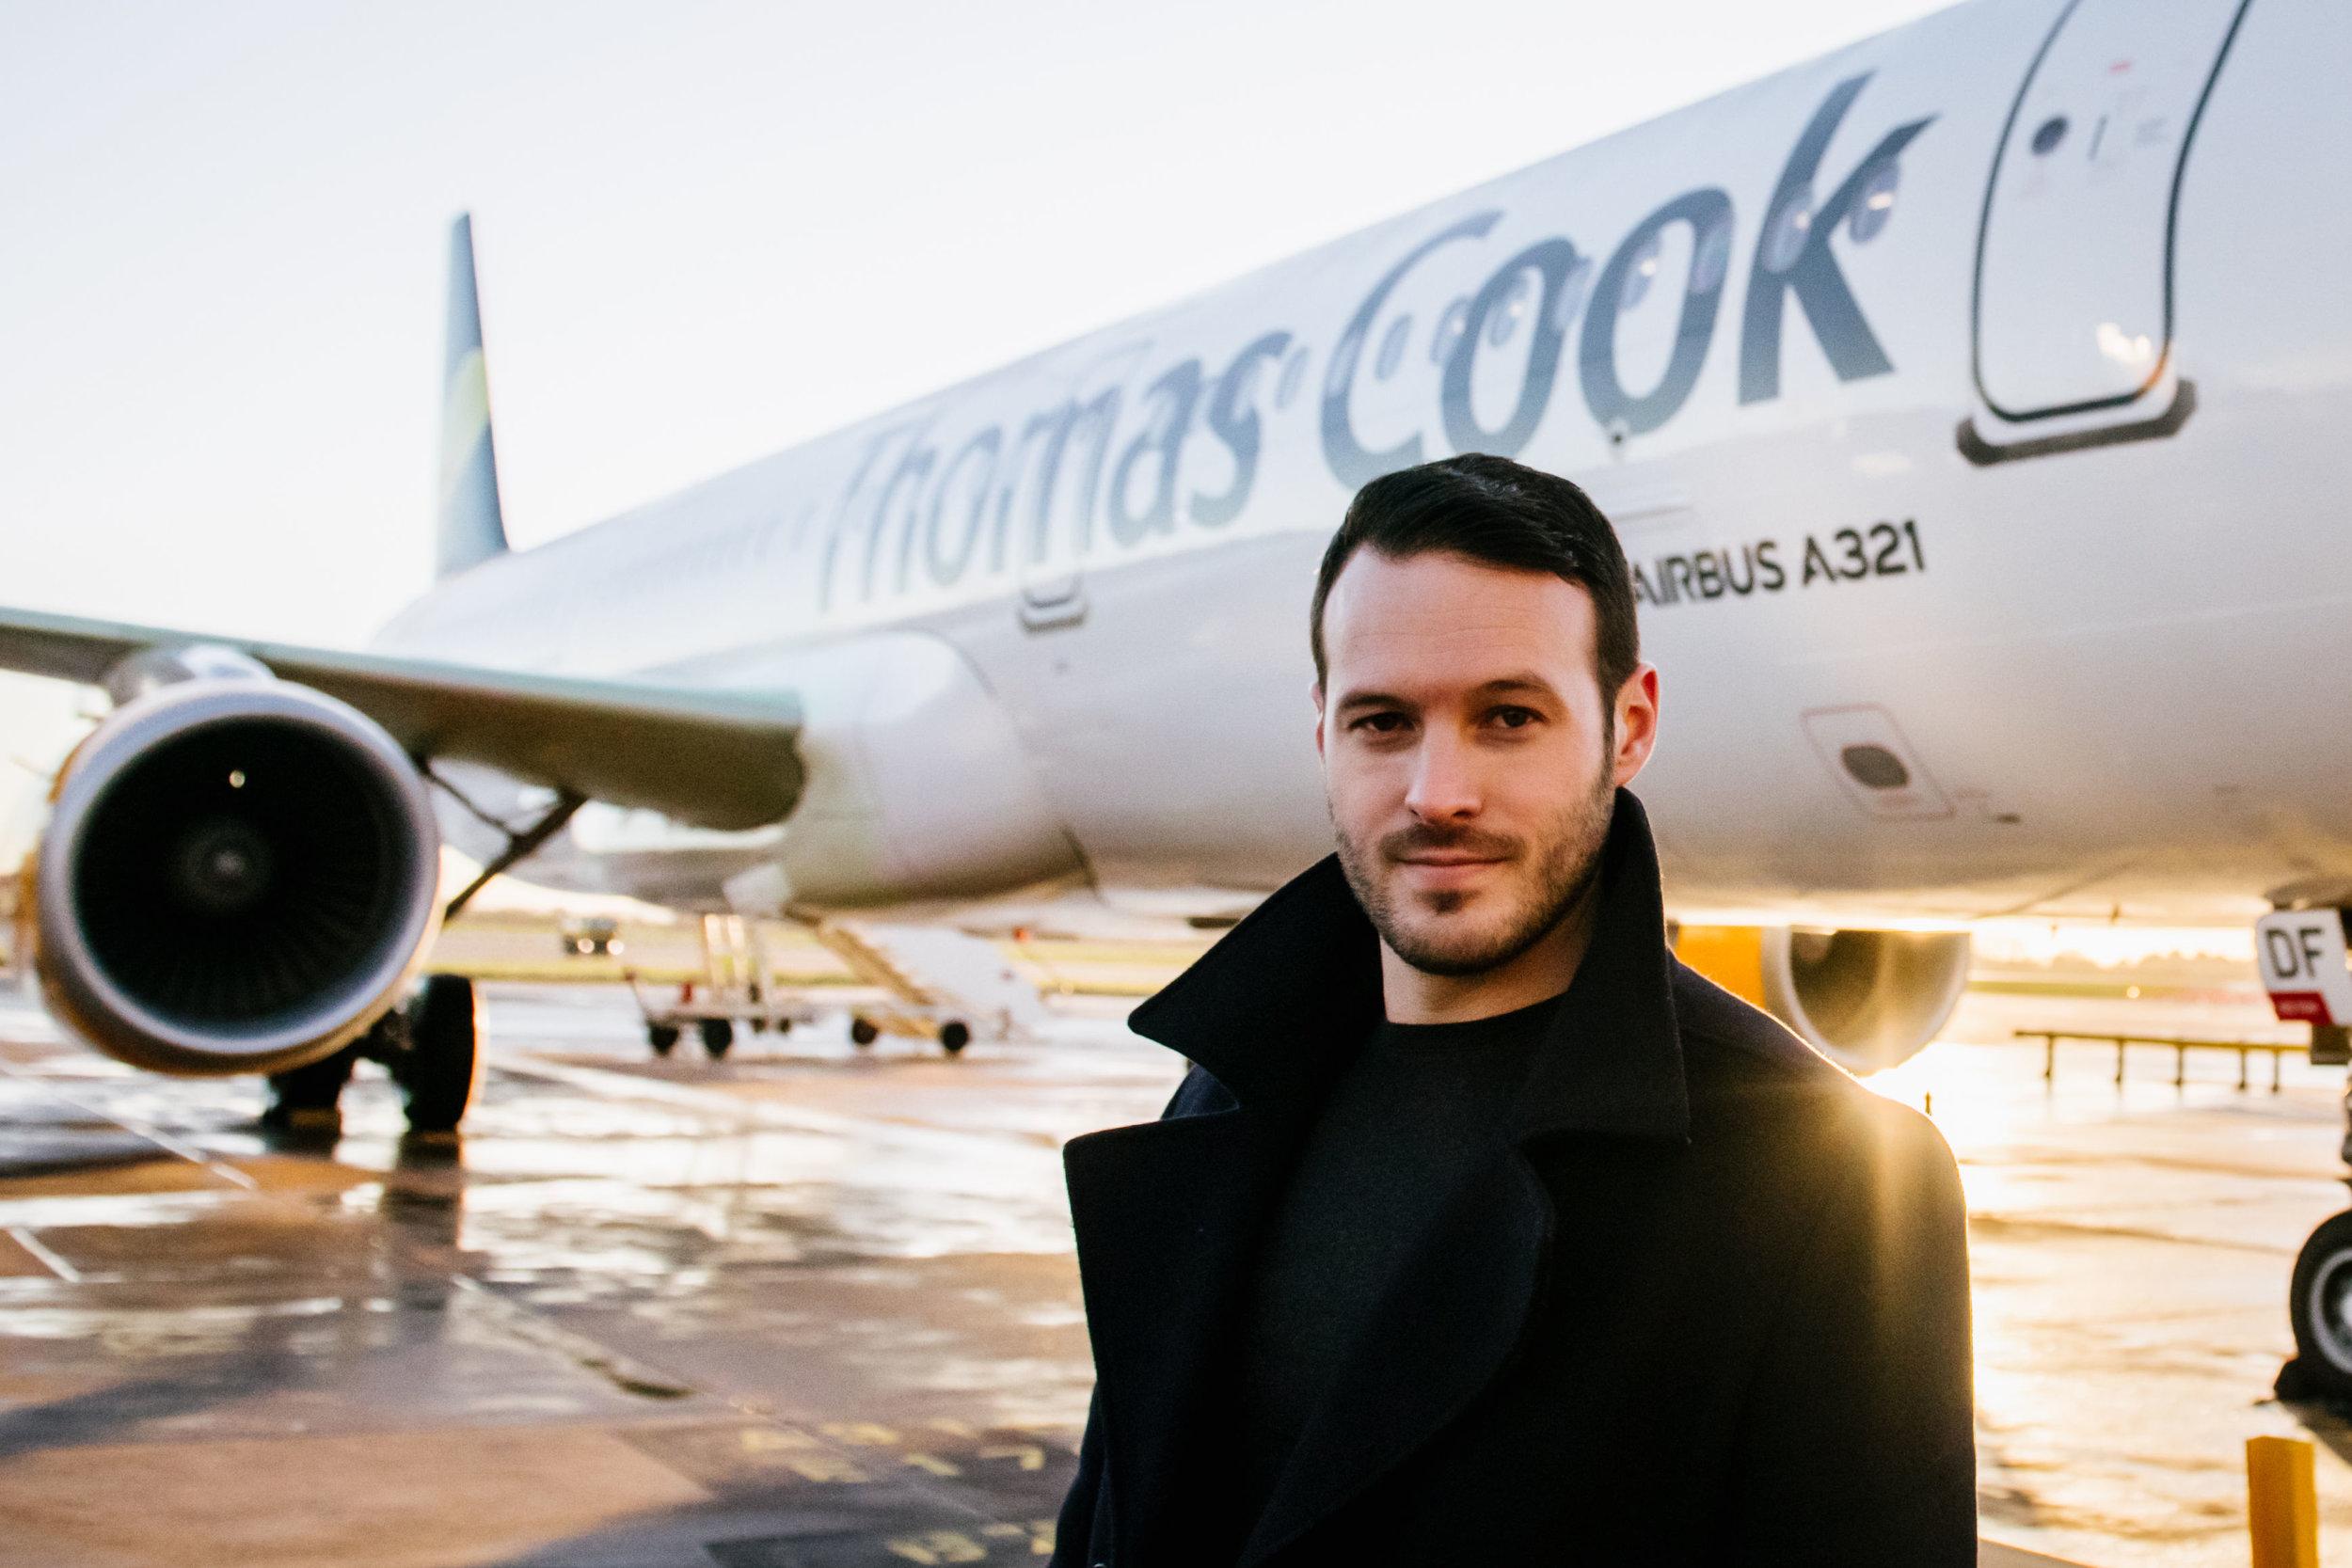 Aaron Calvert 2 Thomas Cook Airlines 2.jpg